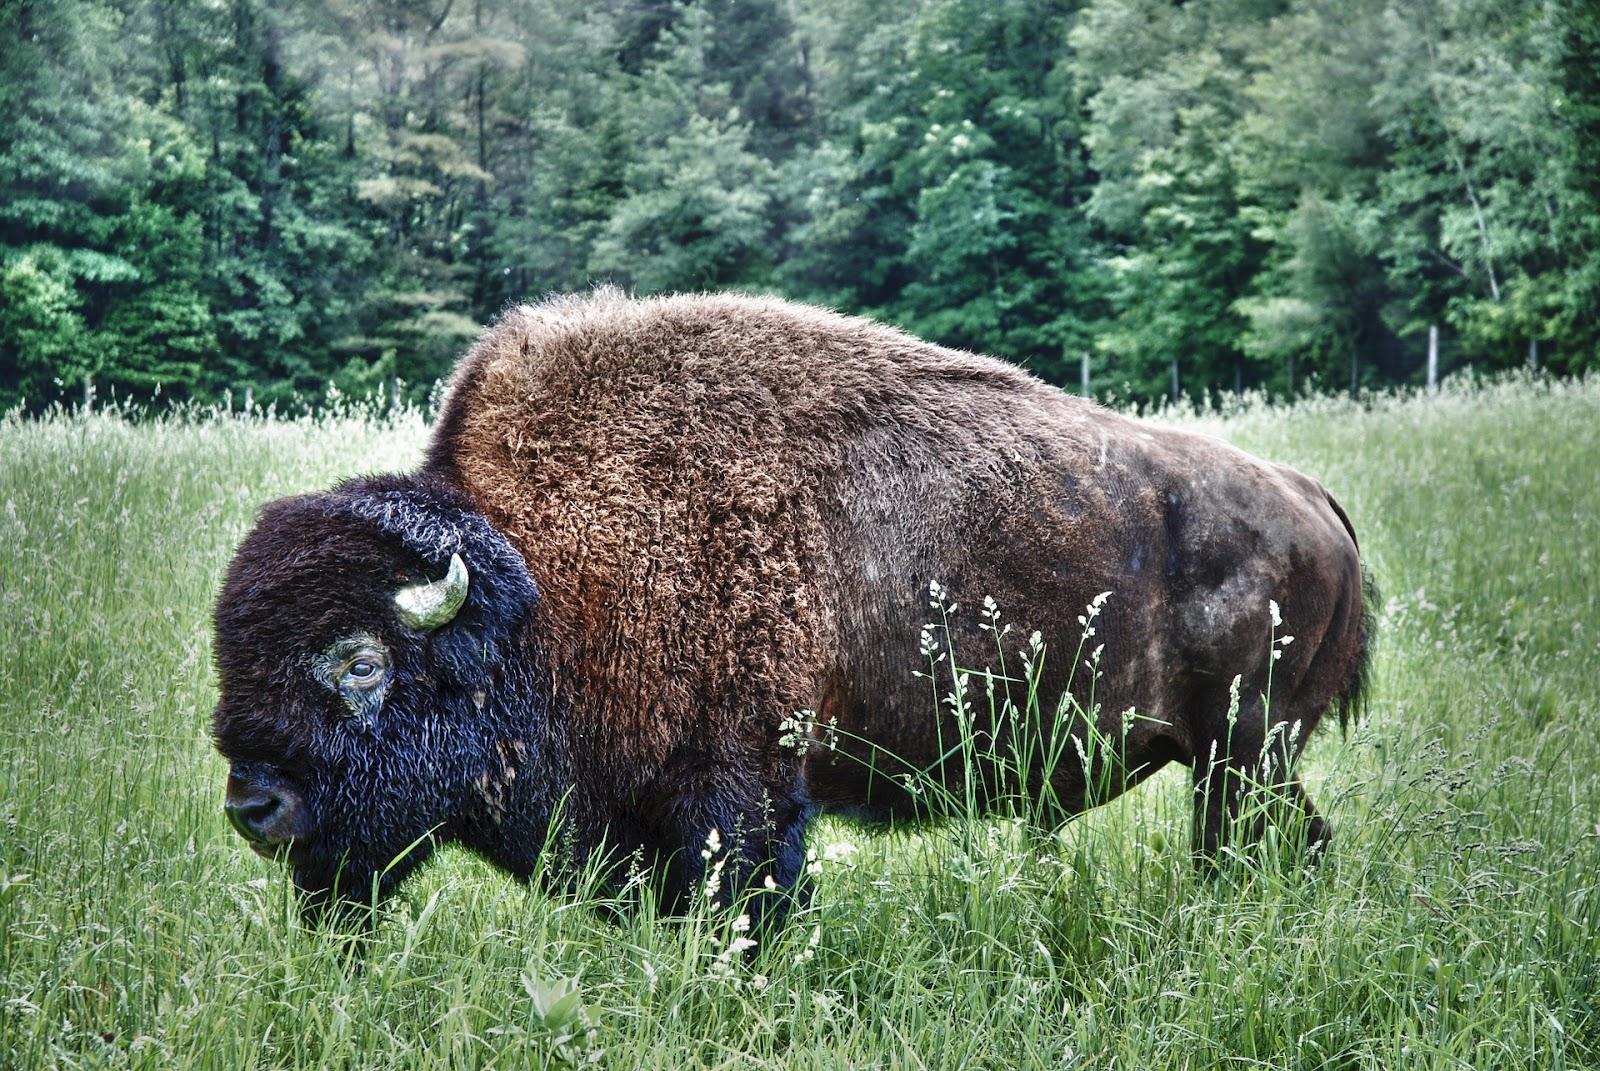 bison-1114095_1920 — kopia.jpg